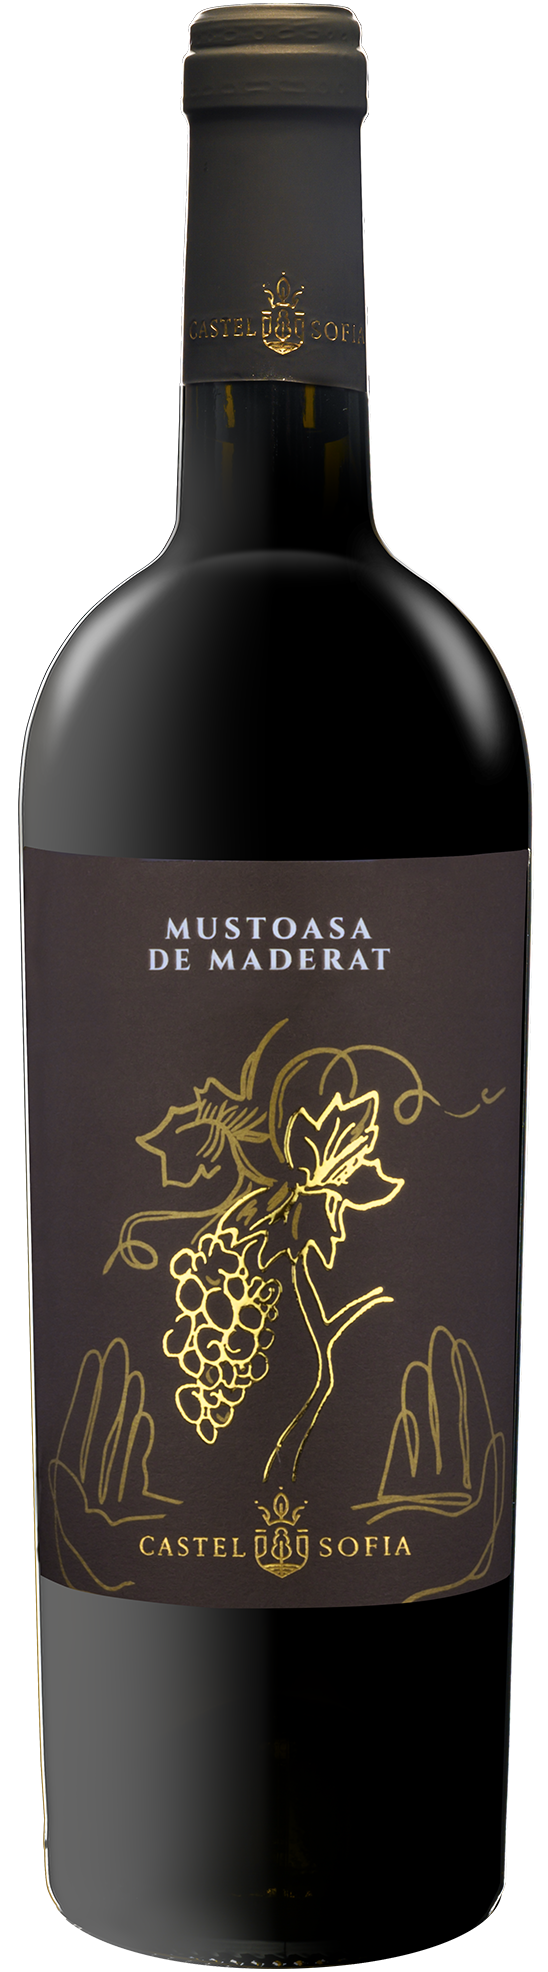 Mustoasa de Maderat 2018